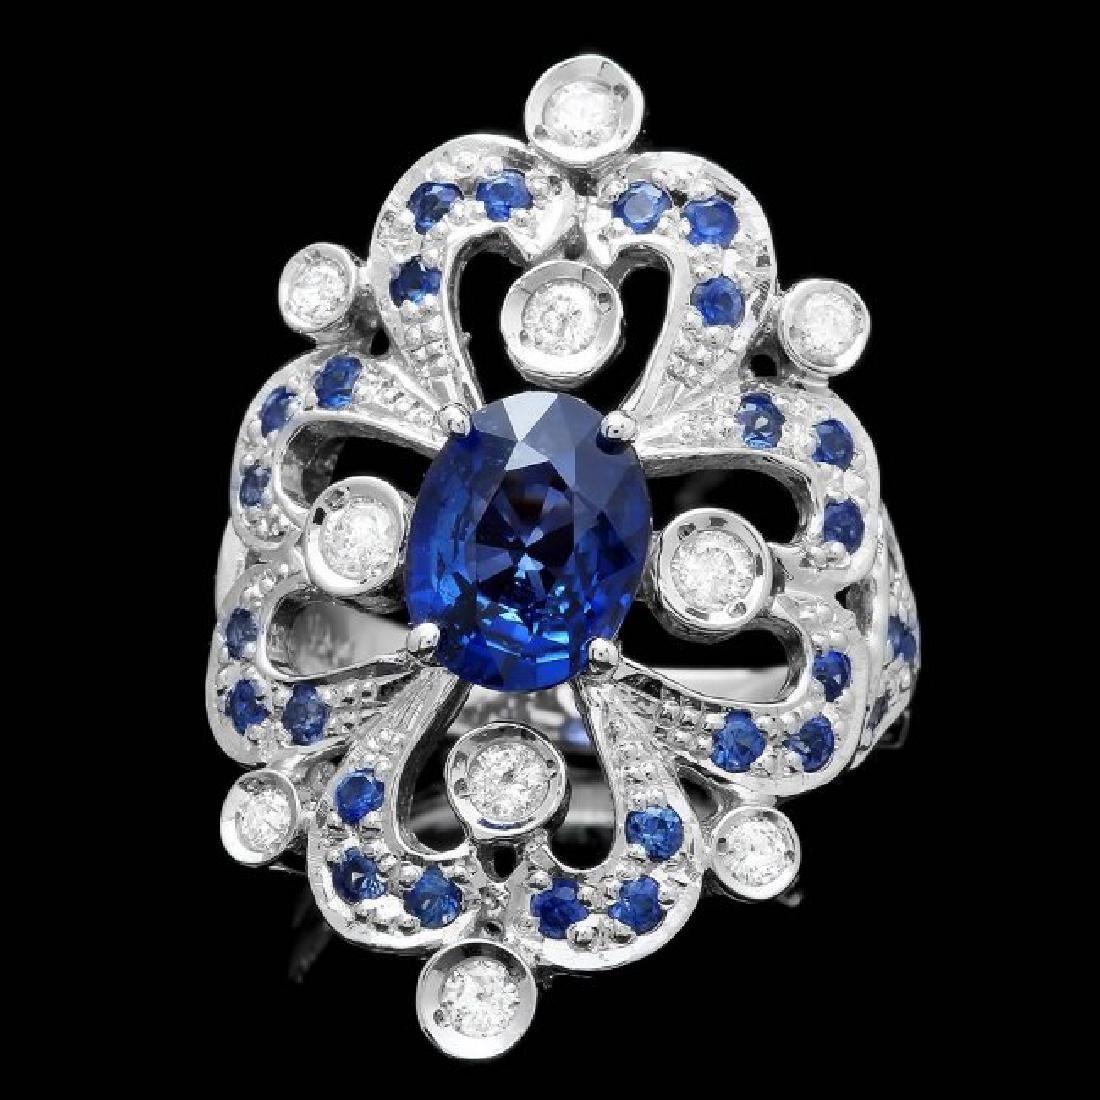 14k Gold 2.85ct Sapphire 0.40ct Diamond Ring